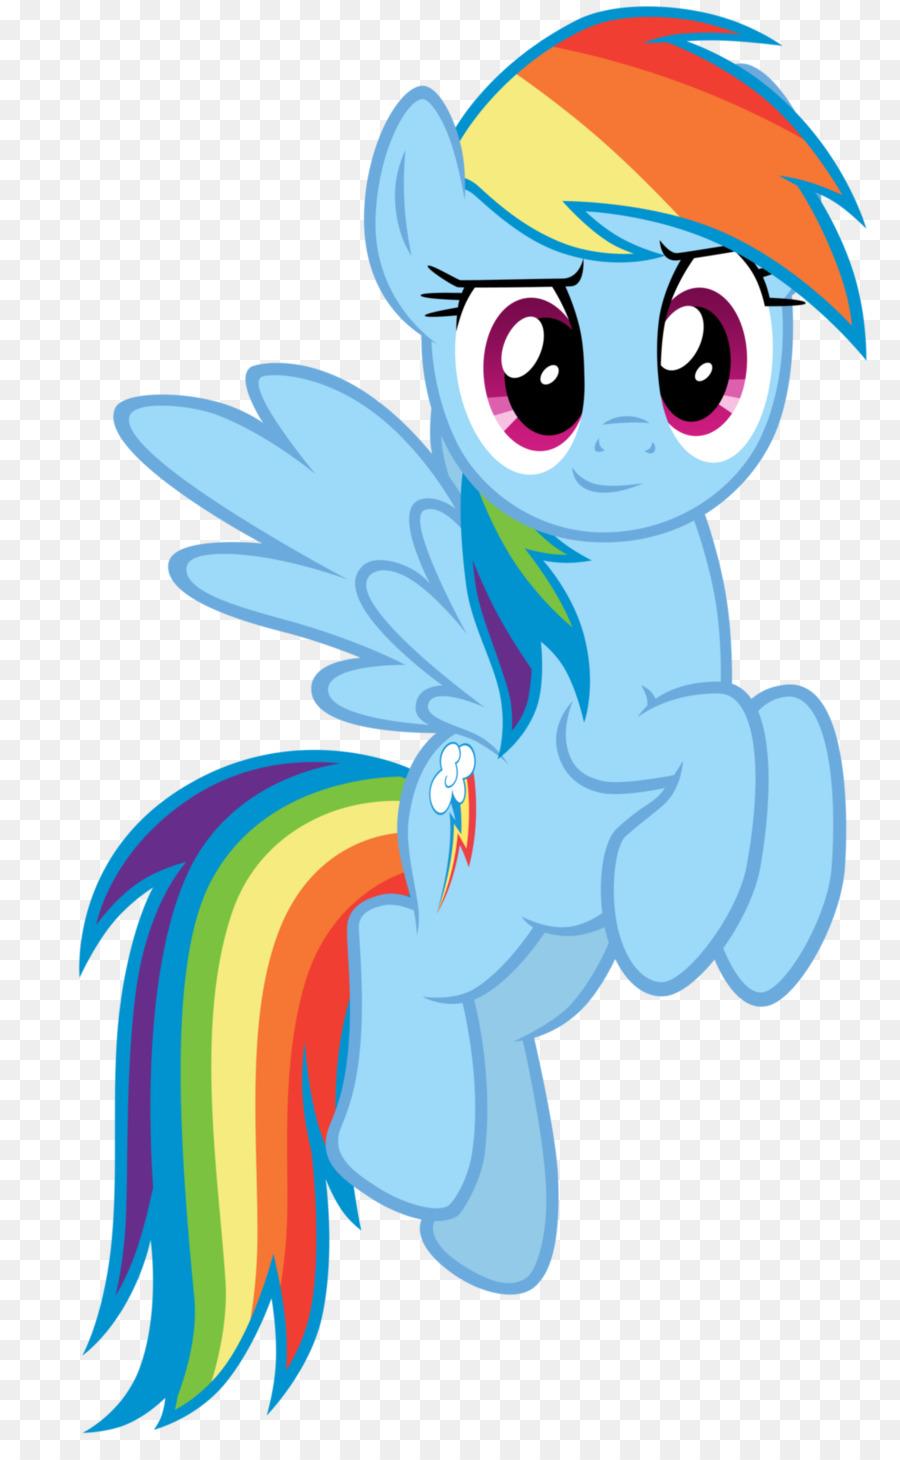 patrick star and dora clipart Rainbow Dash Patrick Star